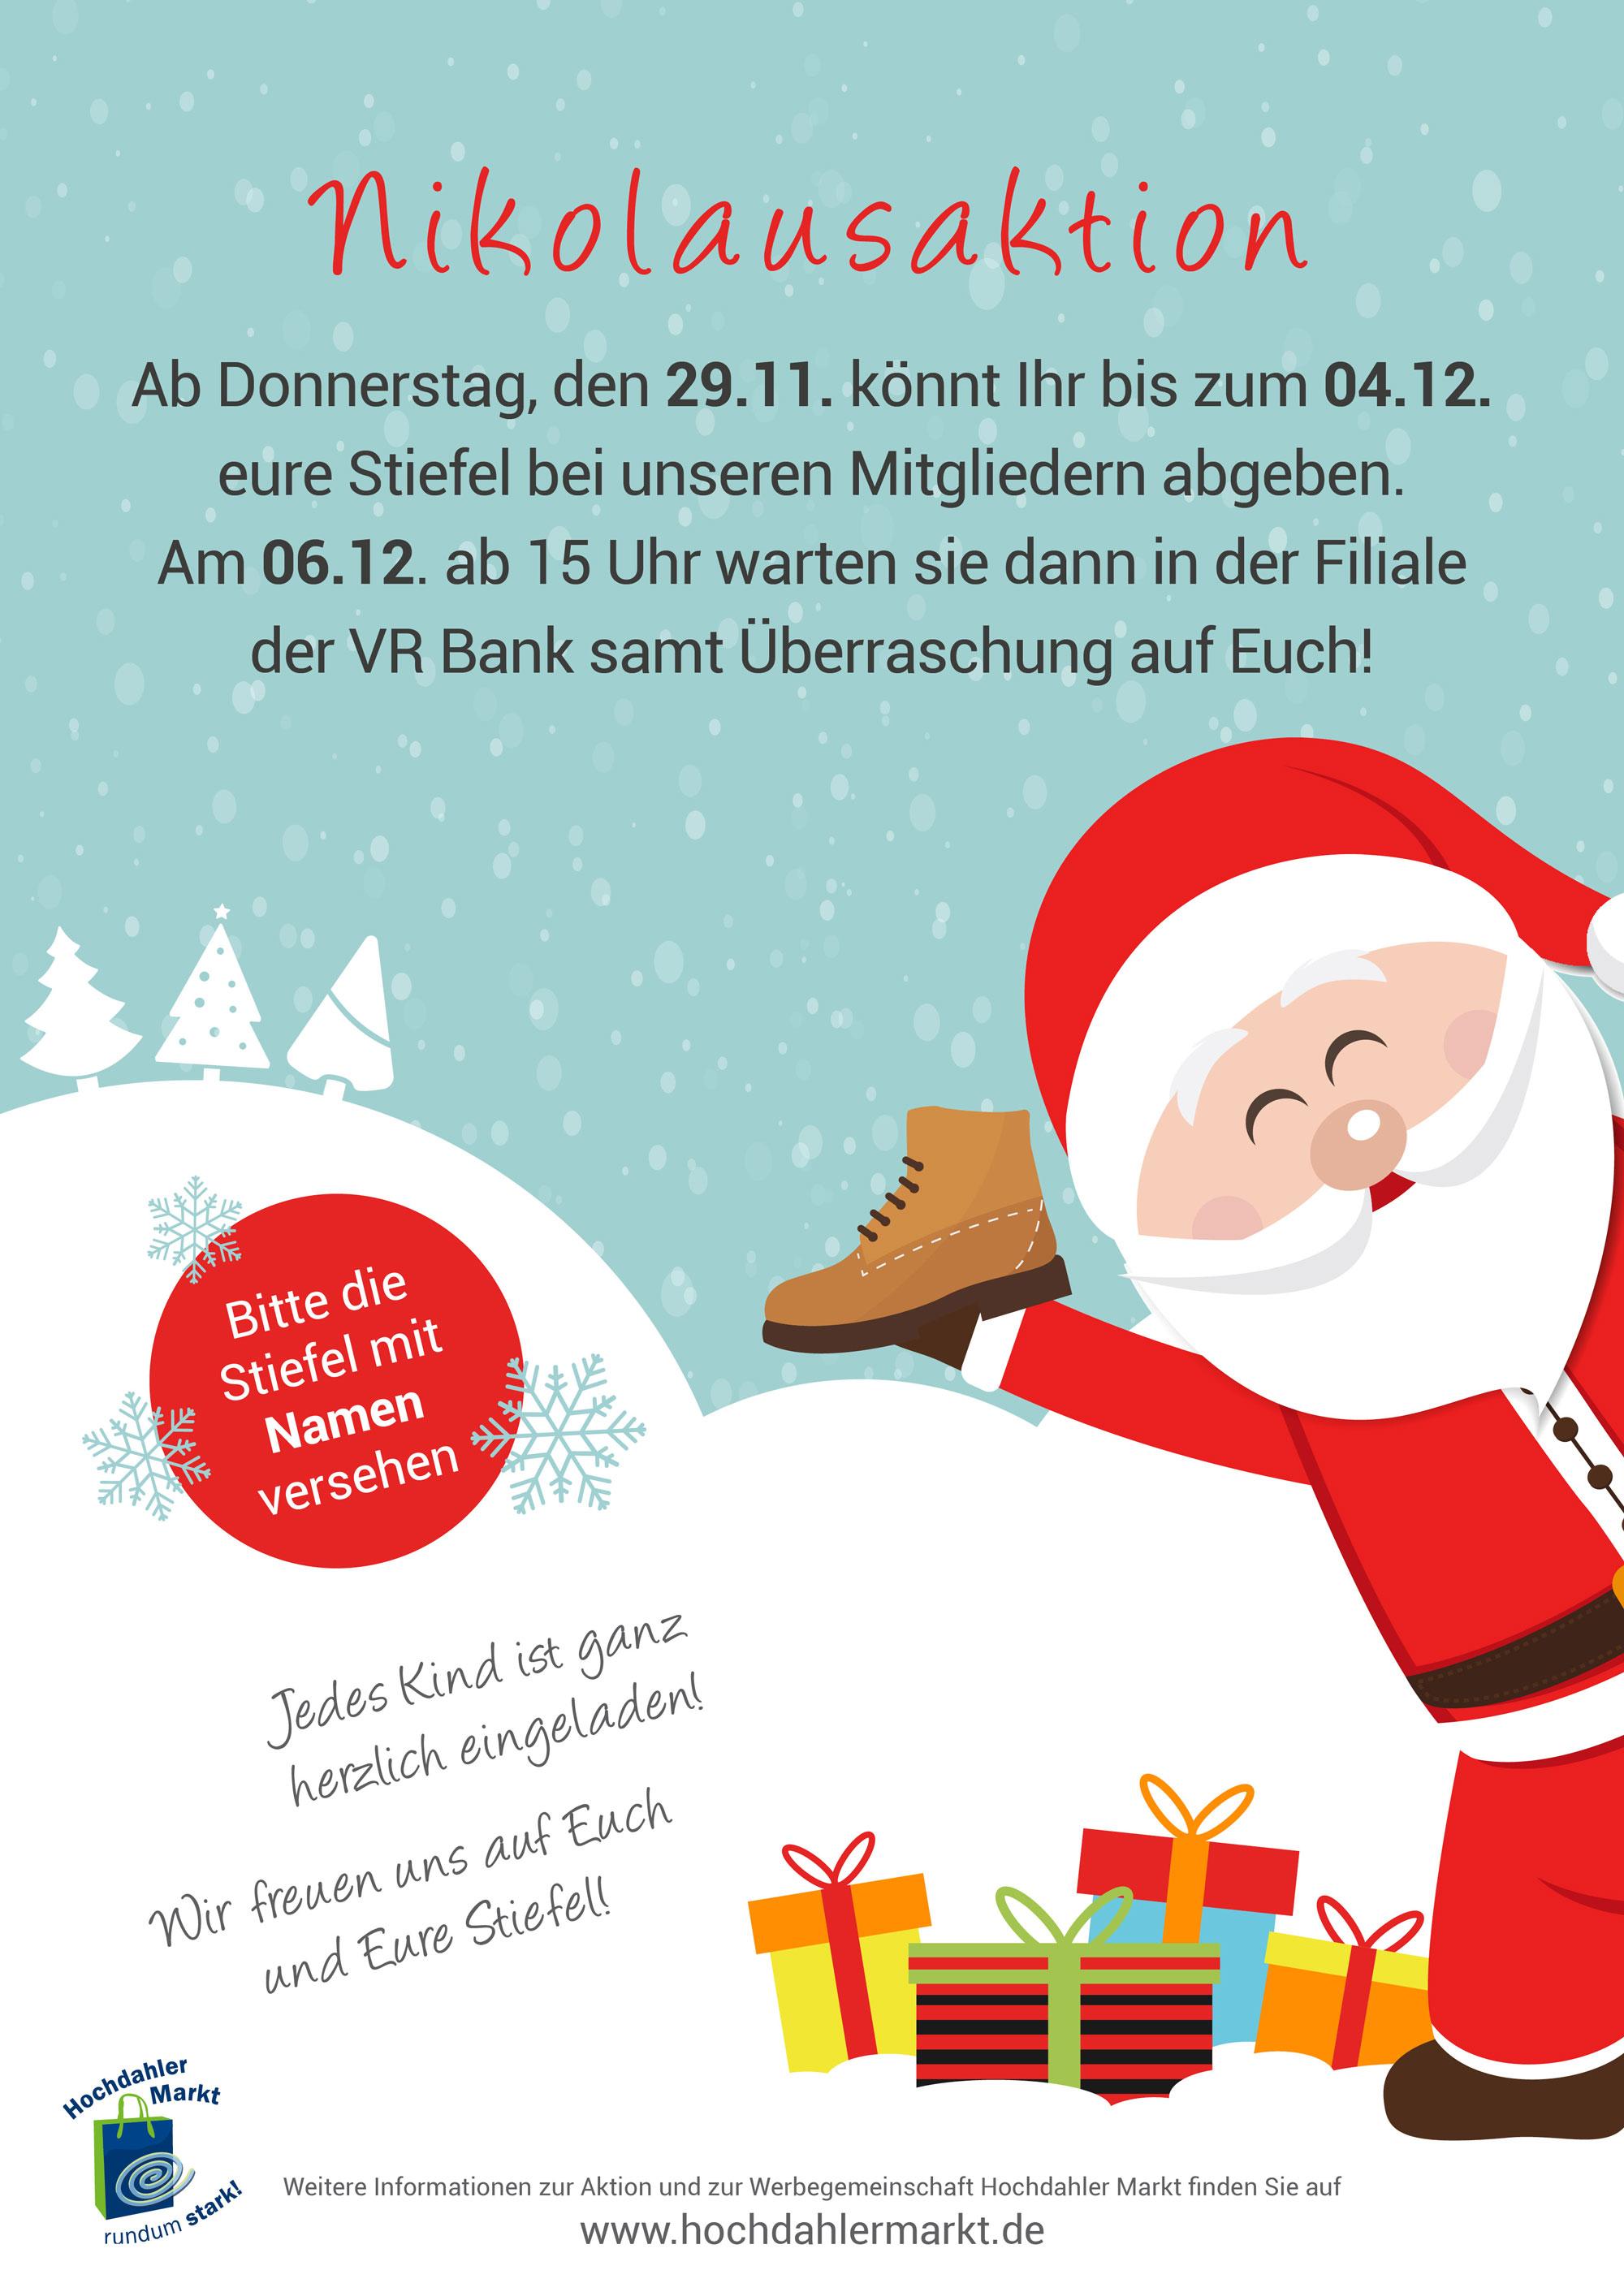 Hochdahler Markt Edeka Plakat